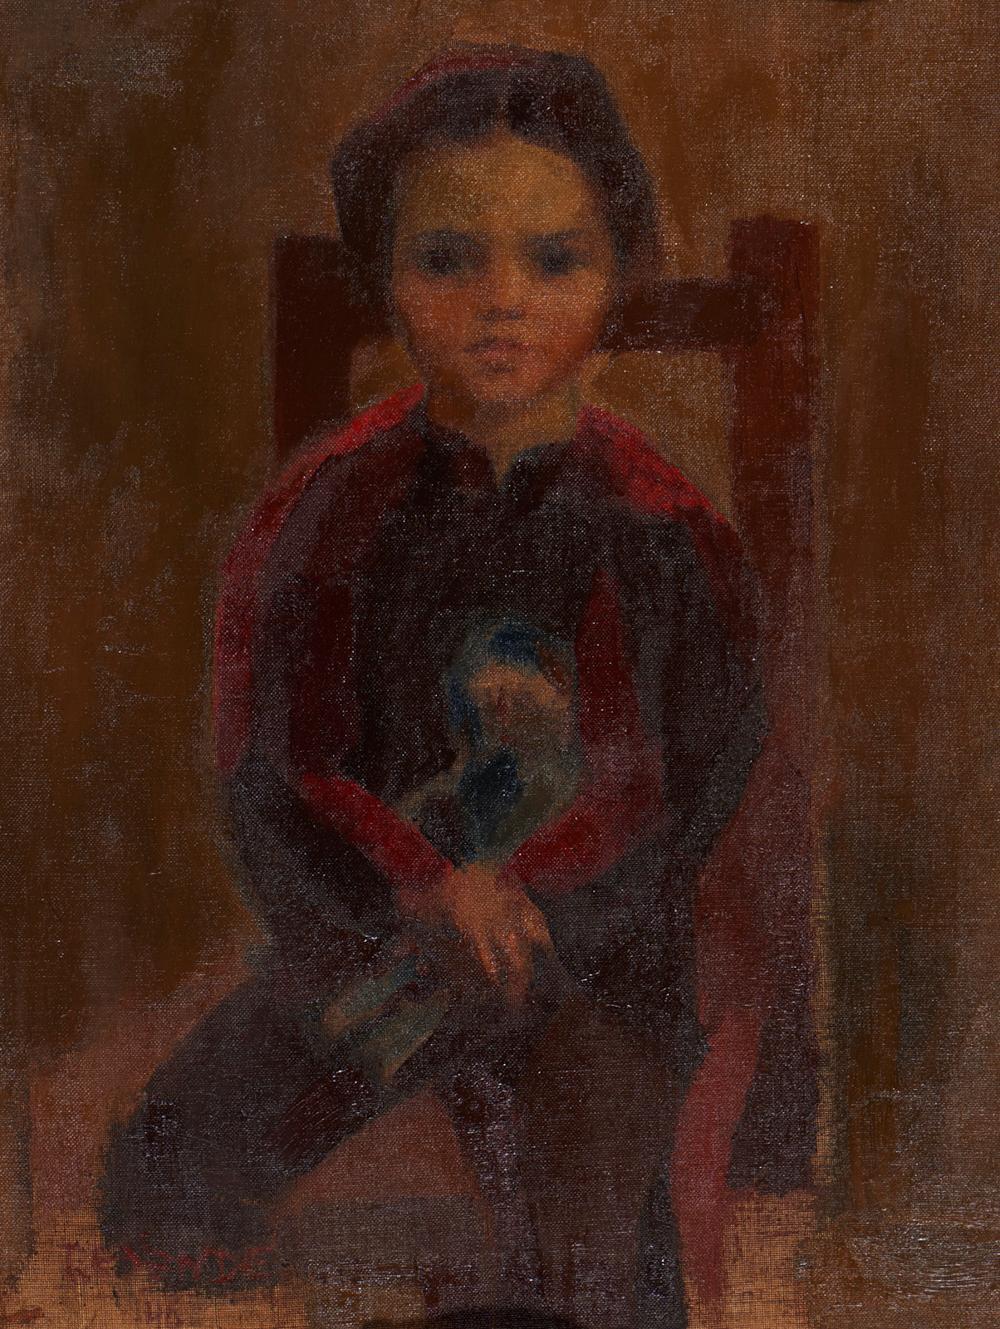 JÚLIO RESENDE, Óleo s/tela, 63 x 46 cm.